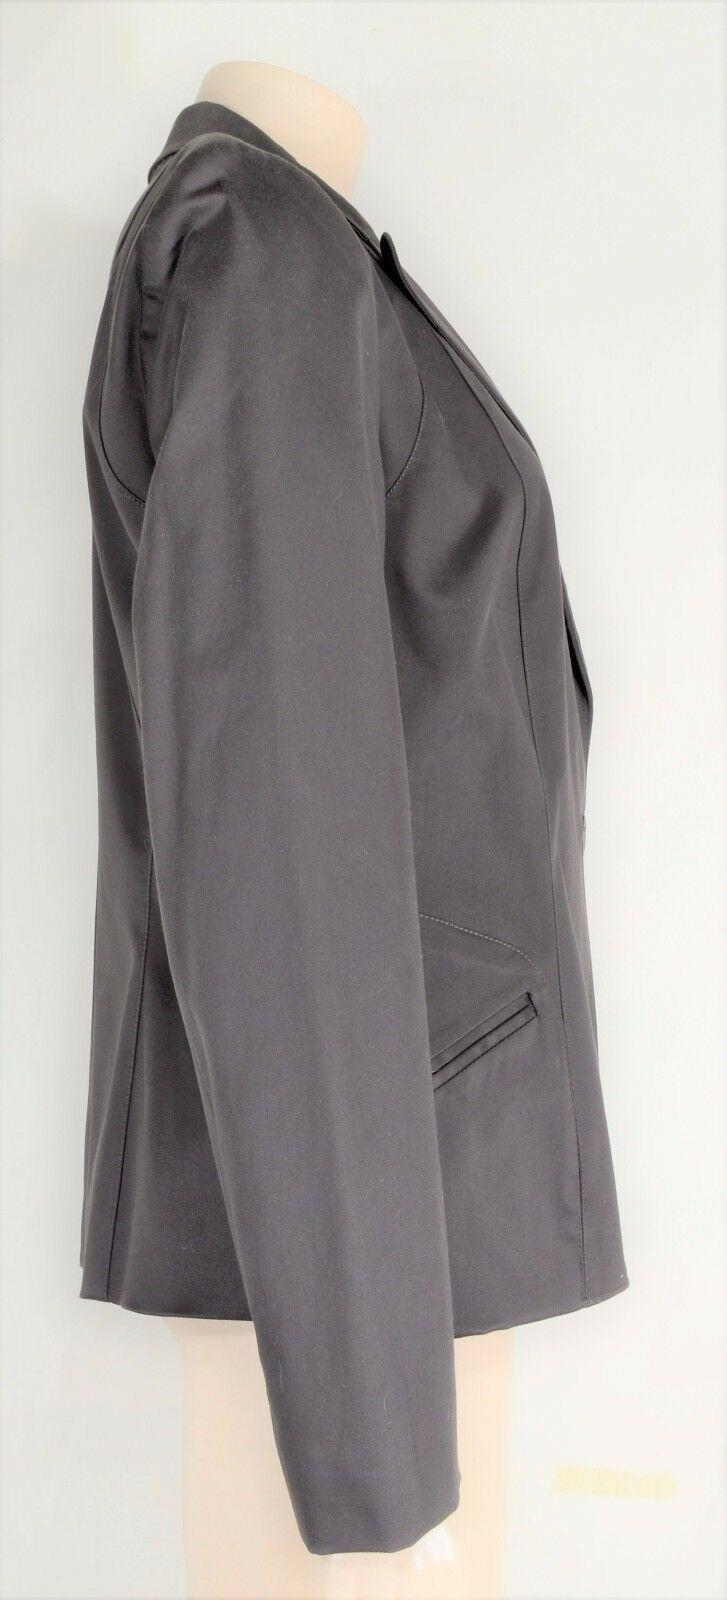 womyn jacket coat NWT SZ 8 dark brown 1-button closure lined NYC USA new image 2